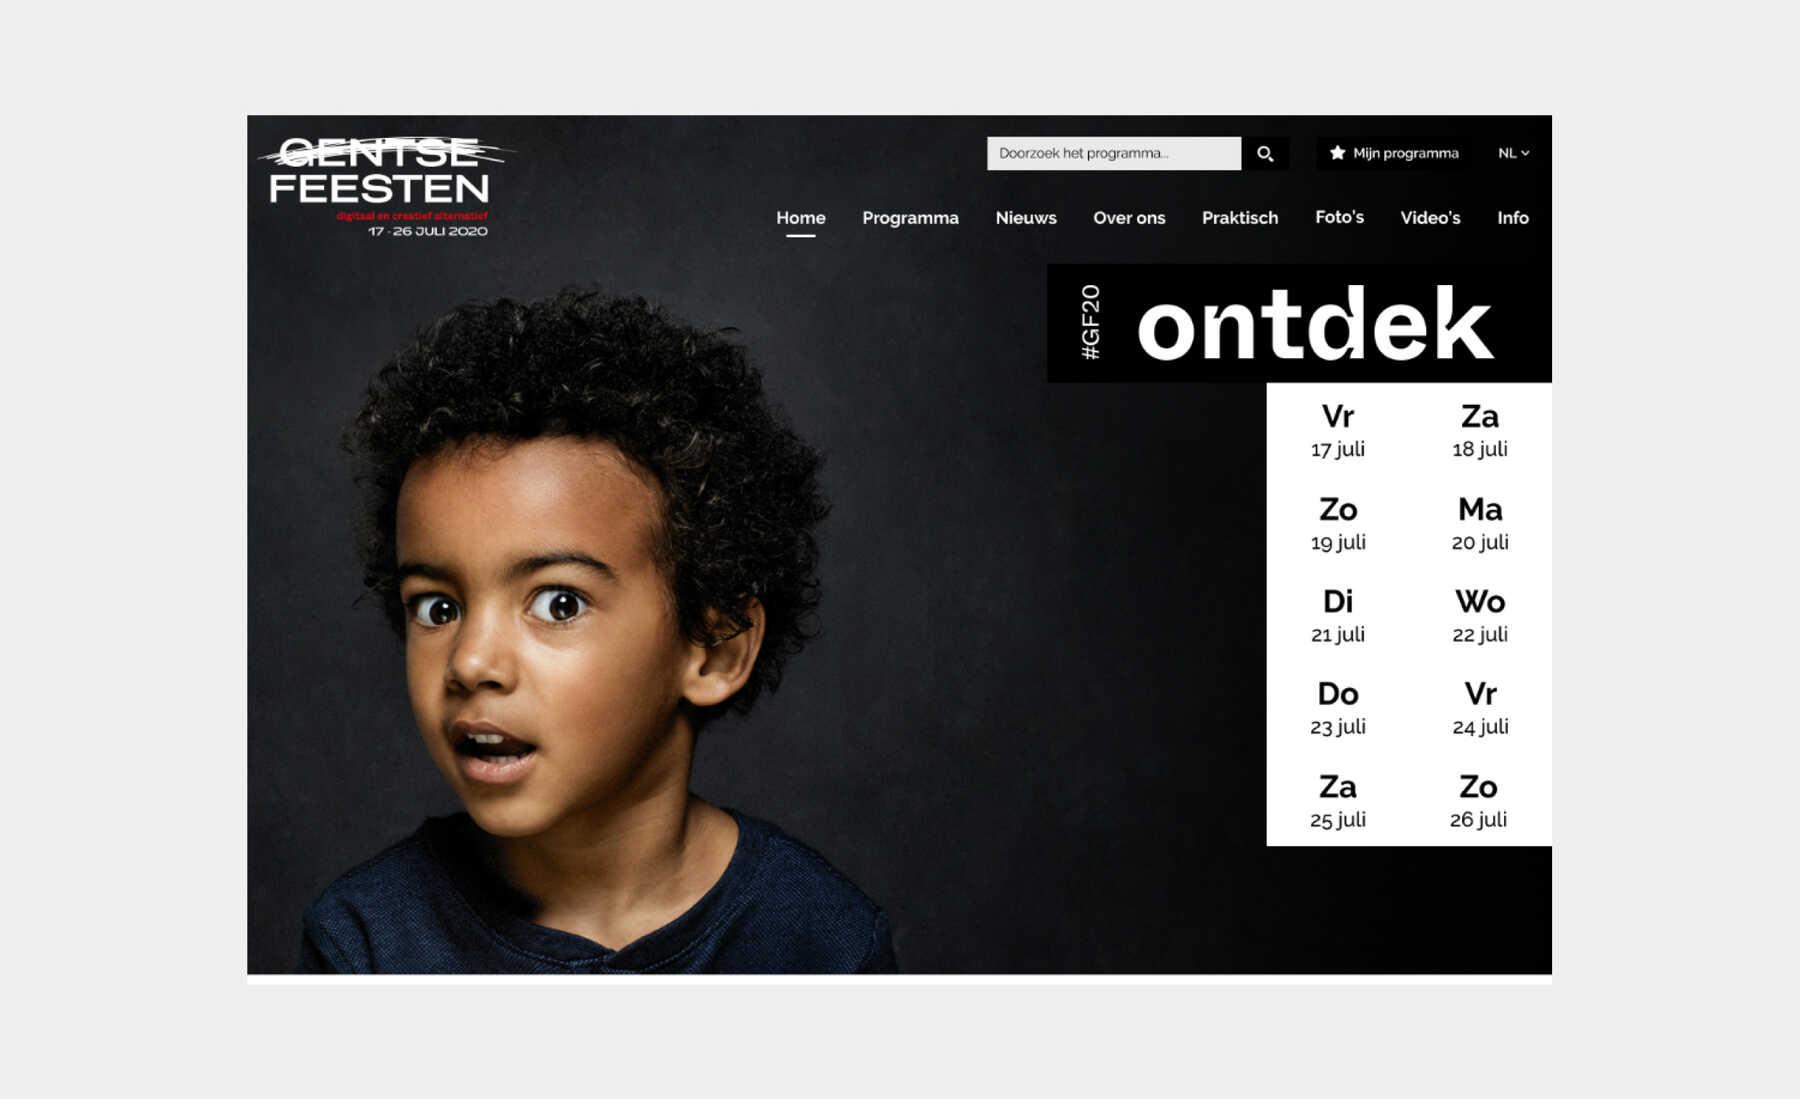 webdesign gentse feesten 2020